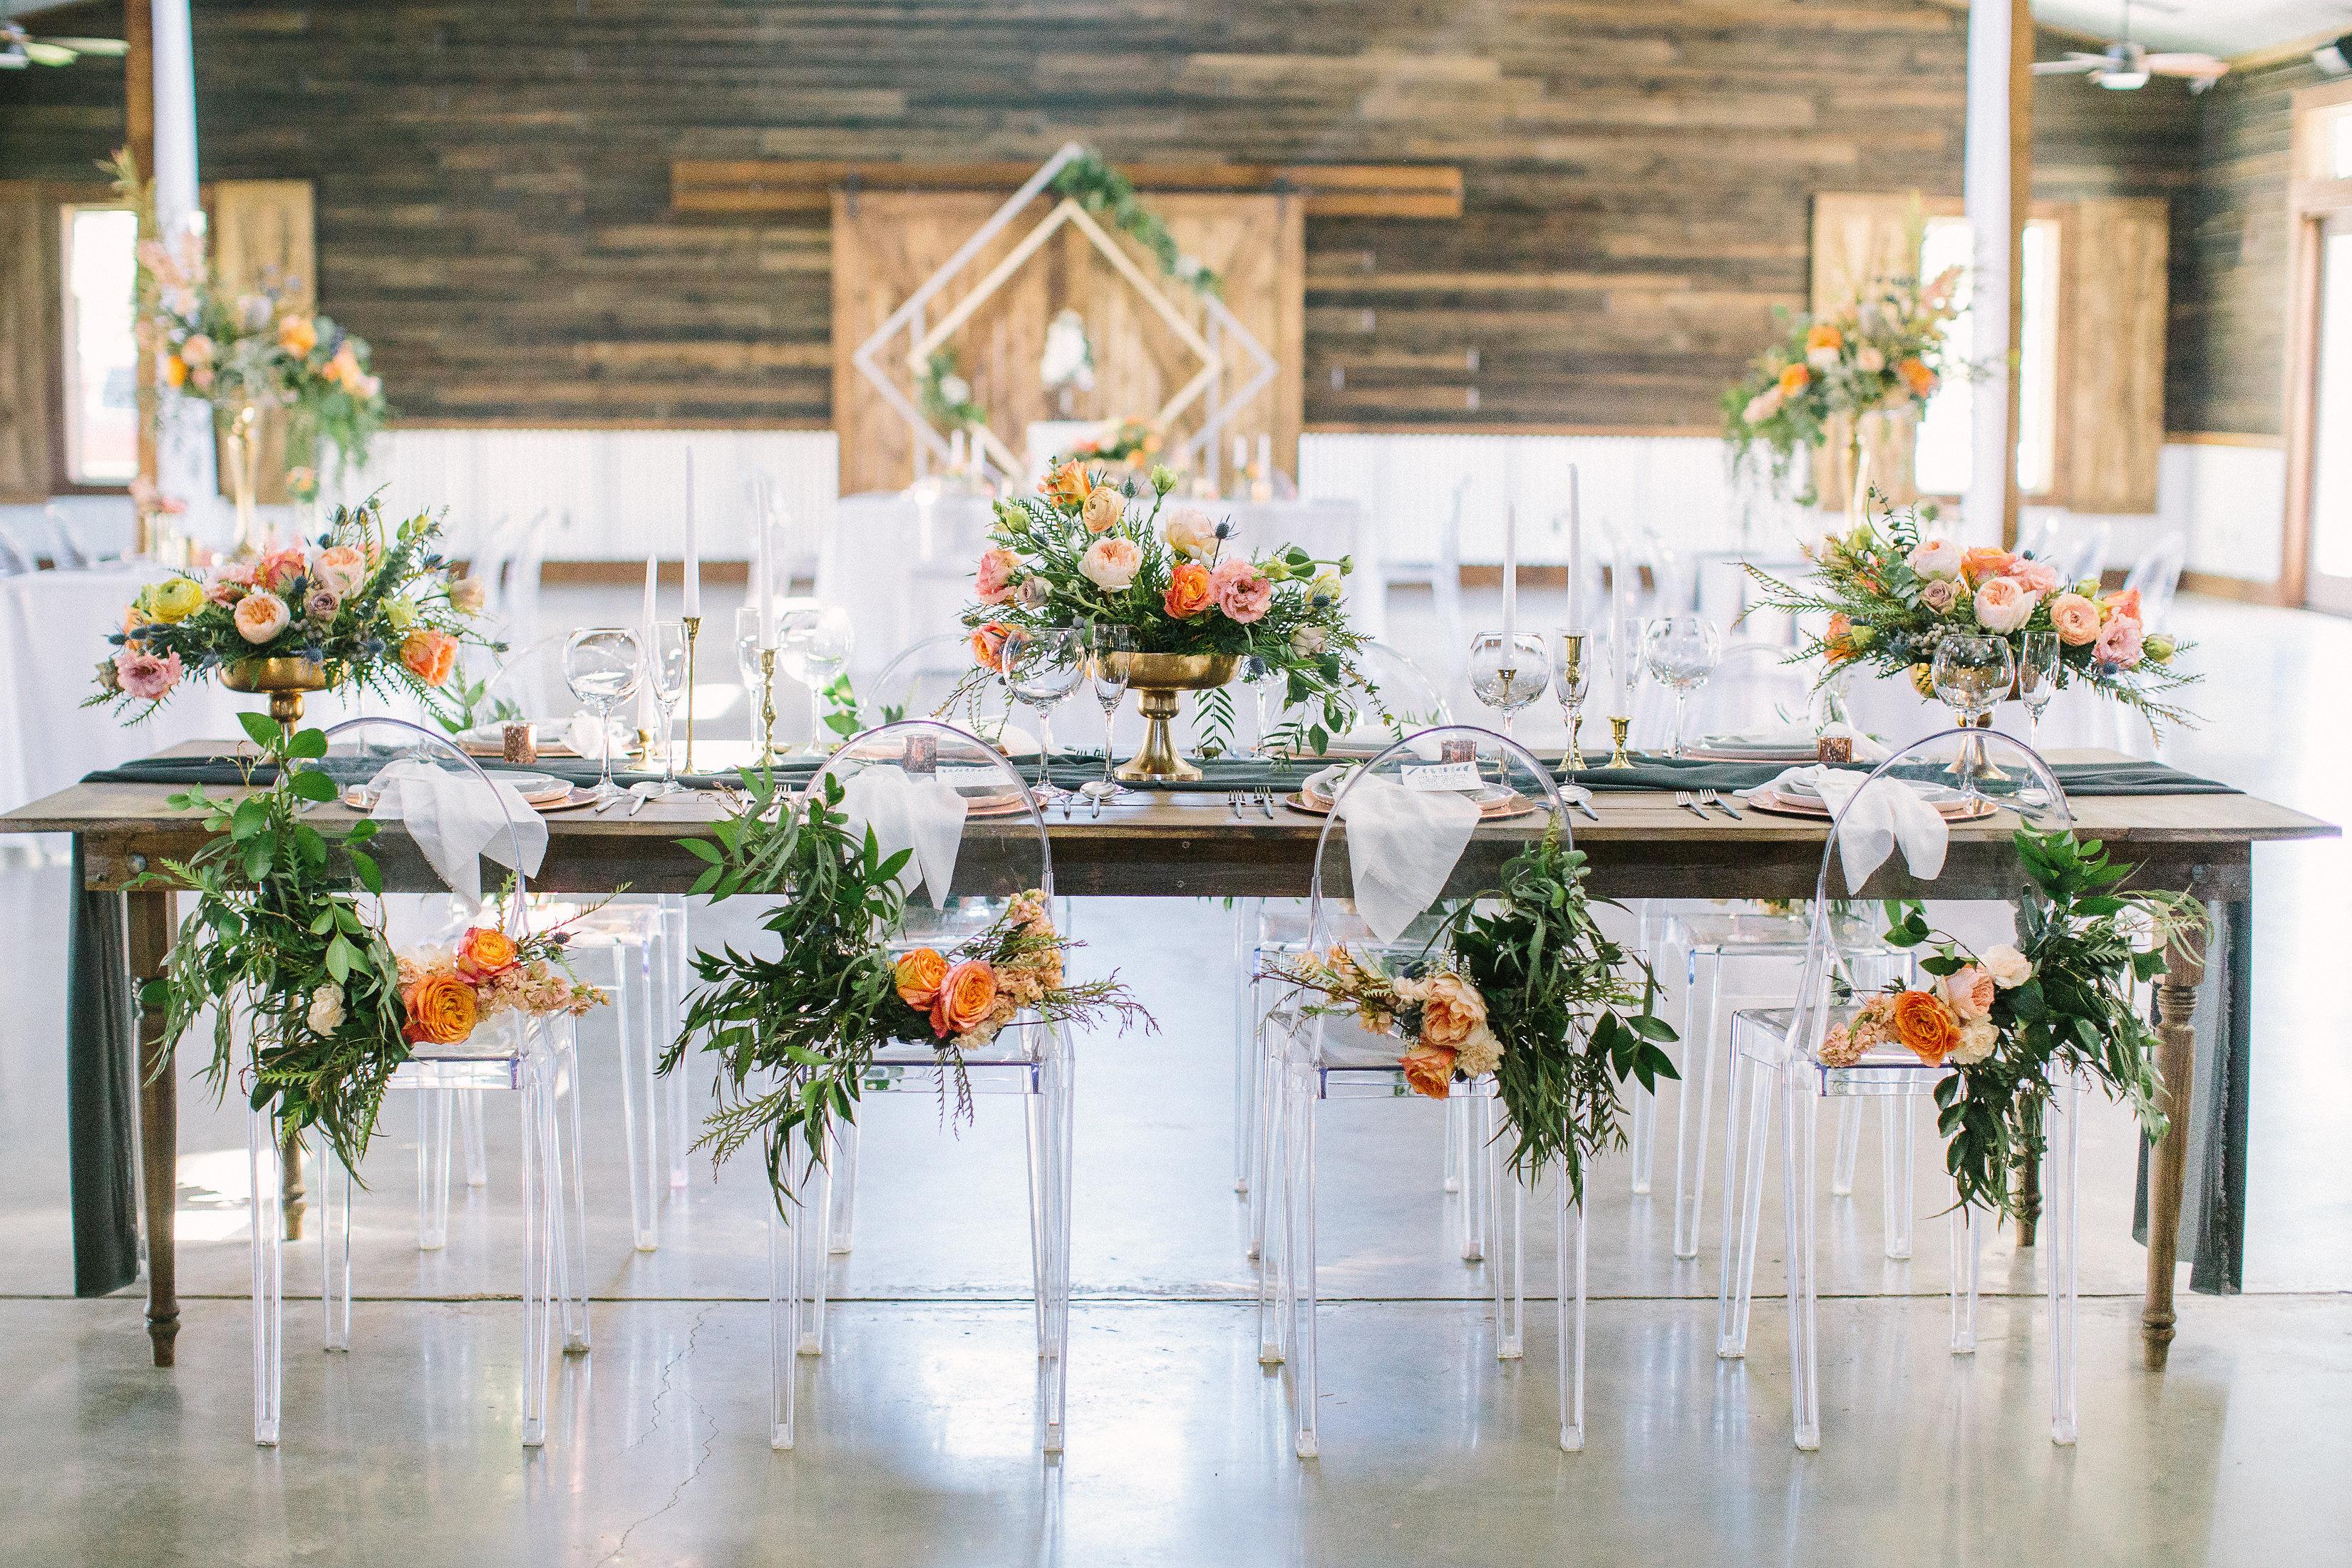 Ellen-Ashton-Photography-Peach-Creek-Ranch-Weddings-Wed-and-Prosper87